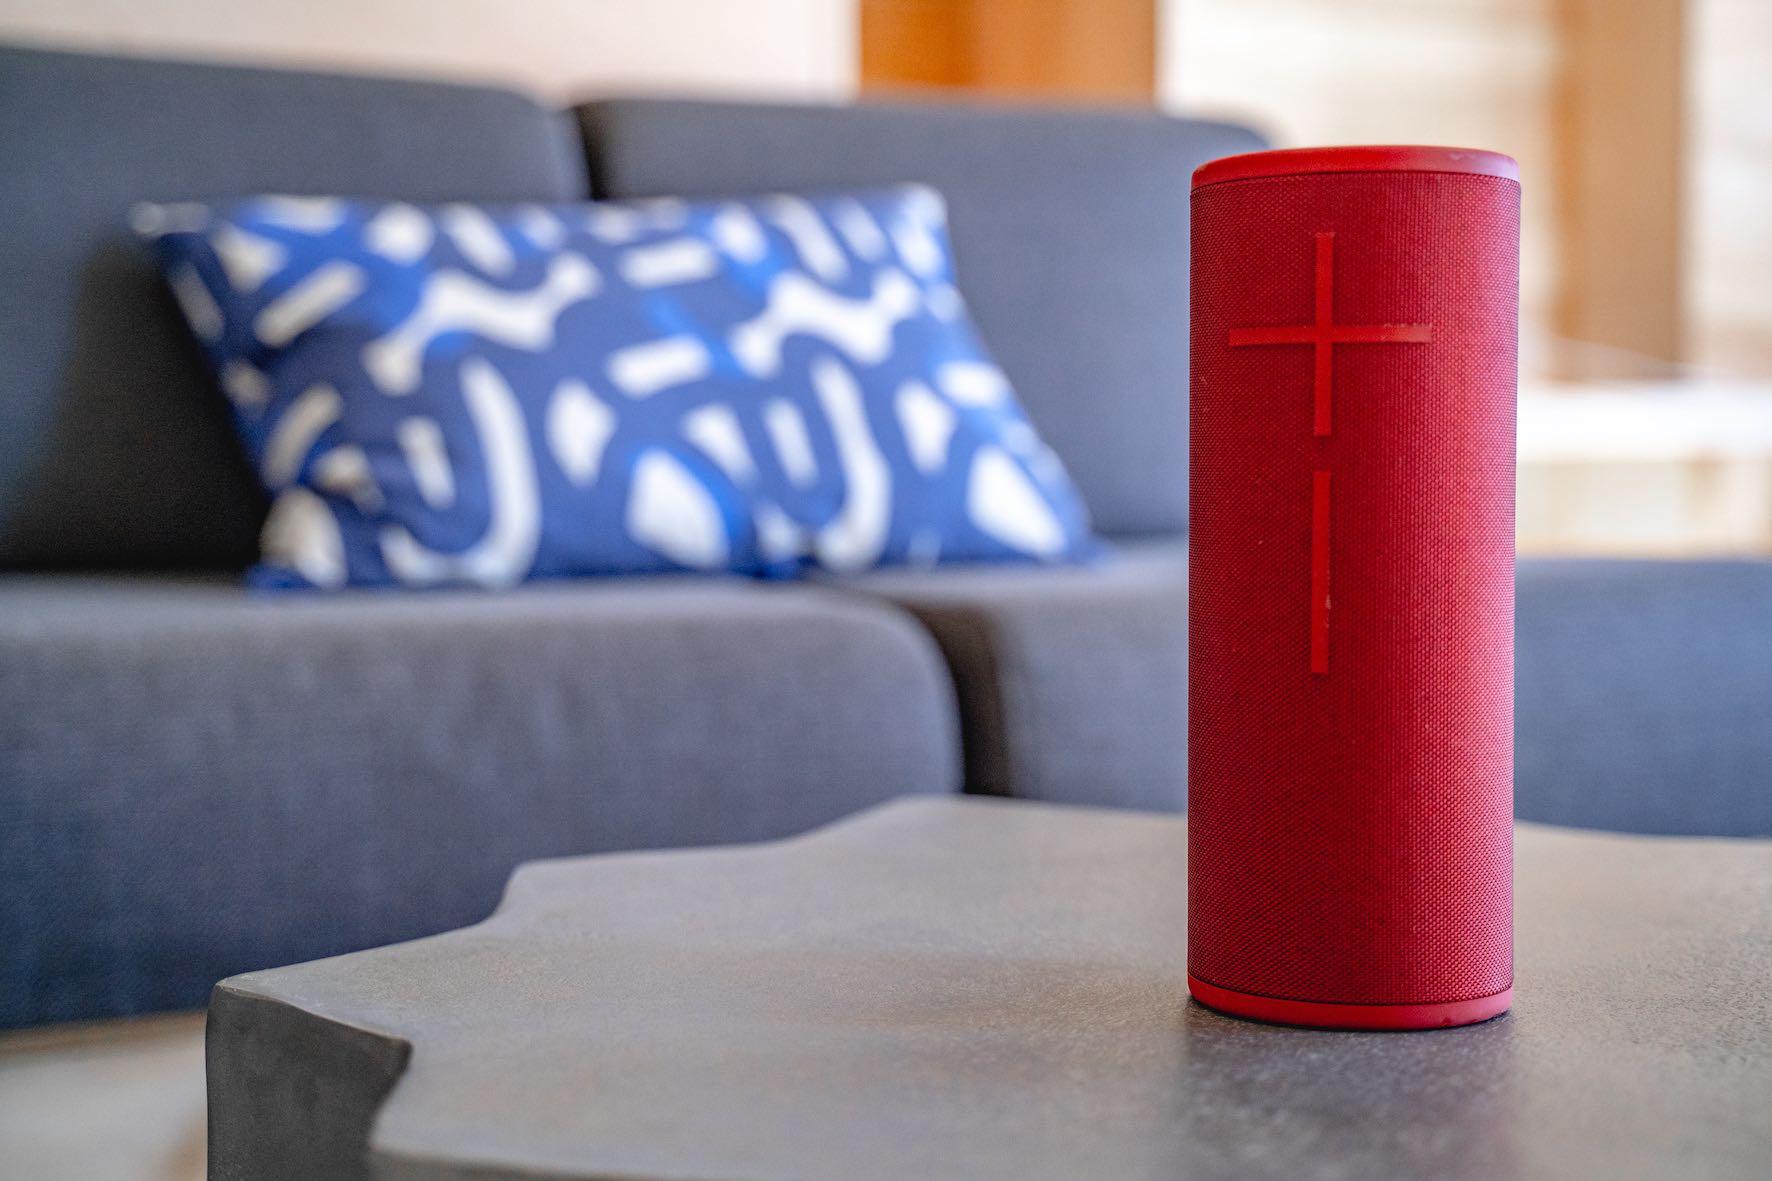 We review the Ultimate Ears MEGABOOM 3 Wireless Speaker